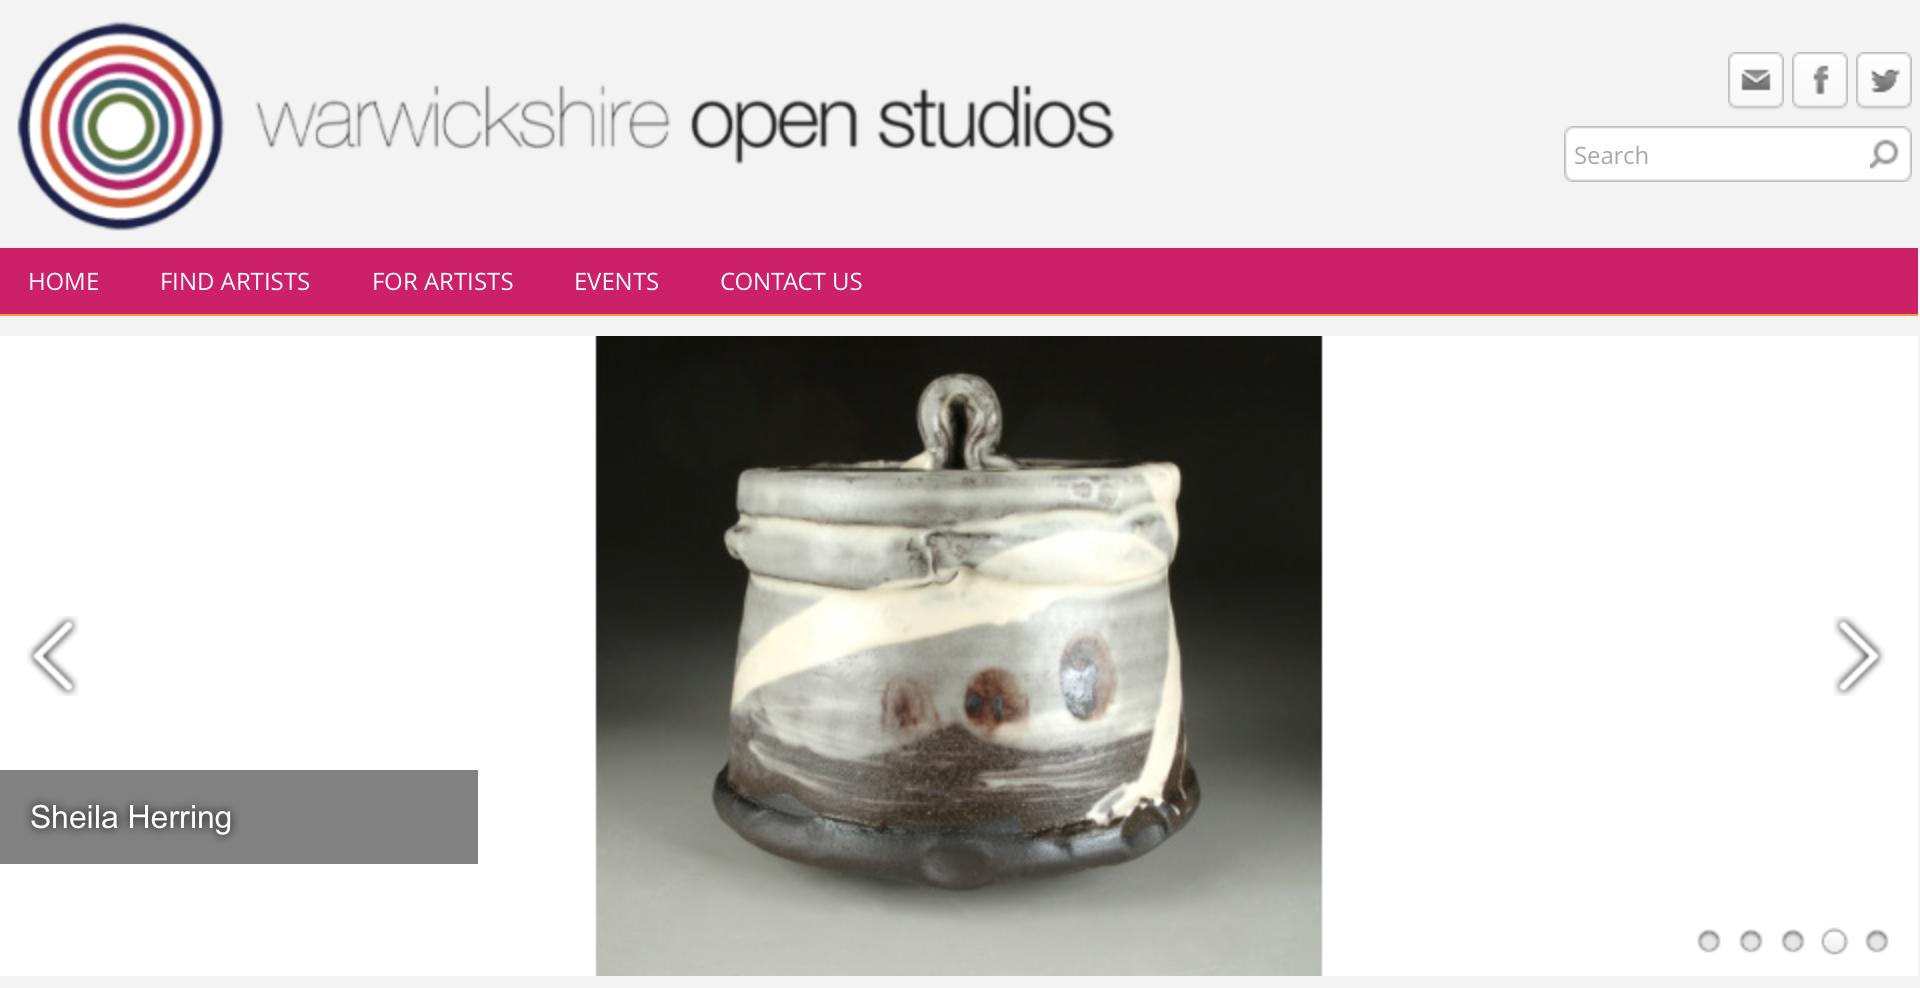 warwickshire open studios sheila herring Rhoda Bertz